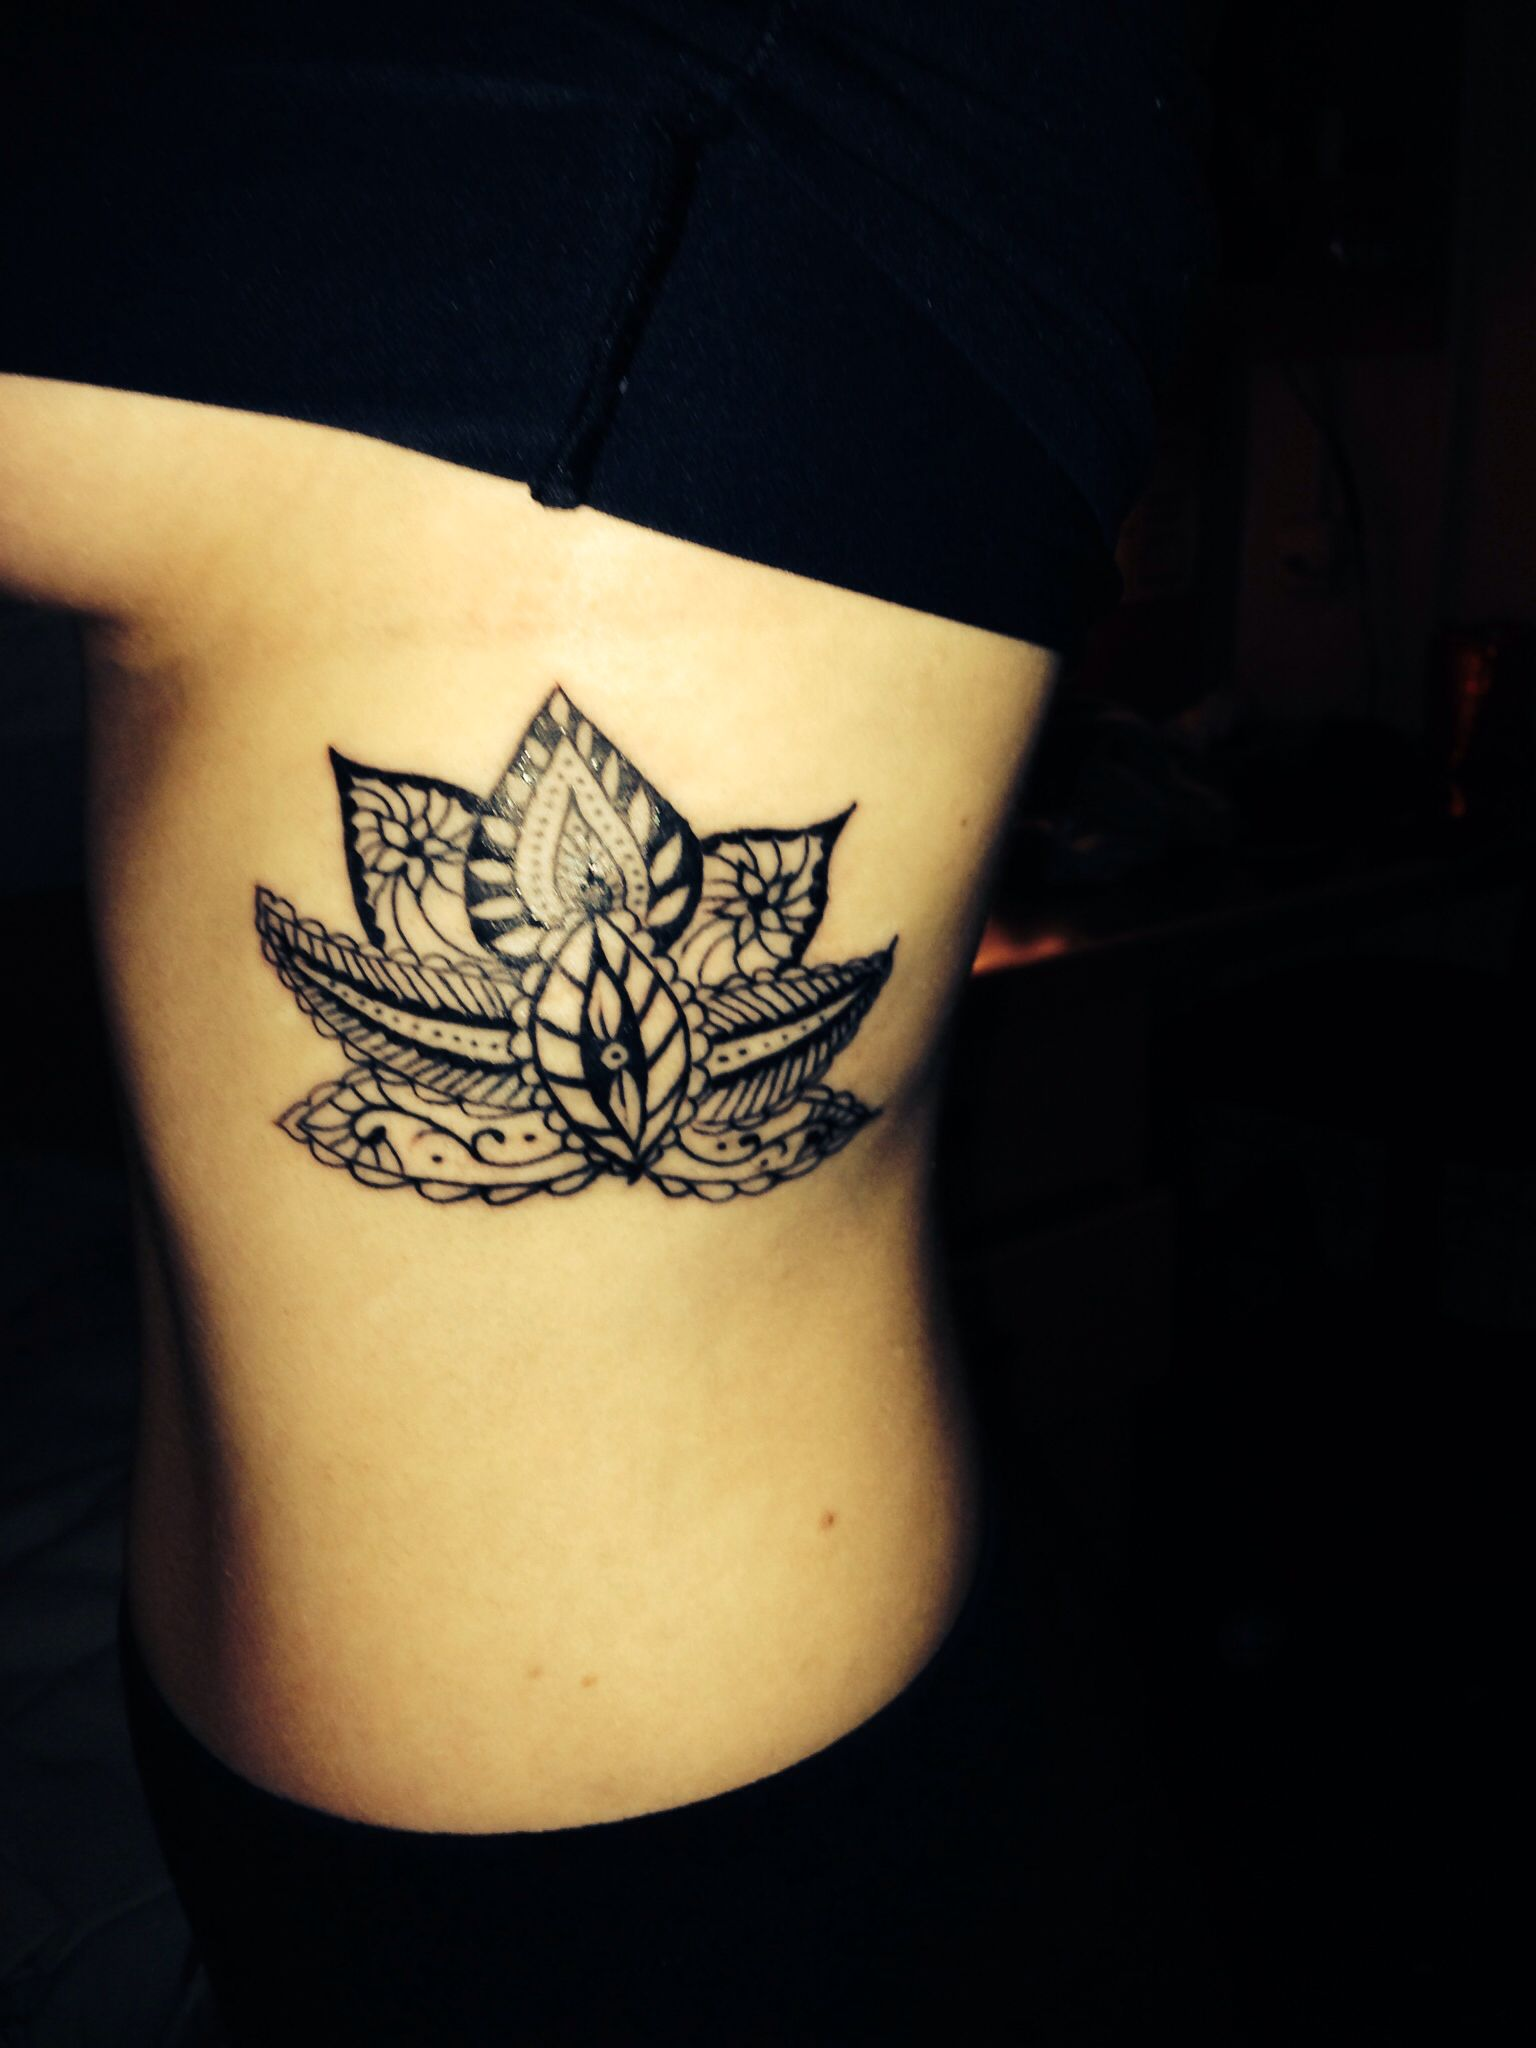 Lotus Flower Rib Cage Tattoo Flower Tattoo Flower Tattoo On Ribs Lotus Flower Tattoo Design